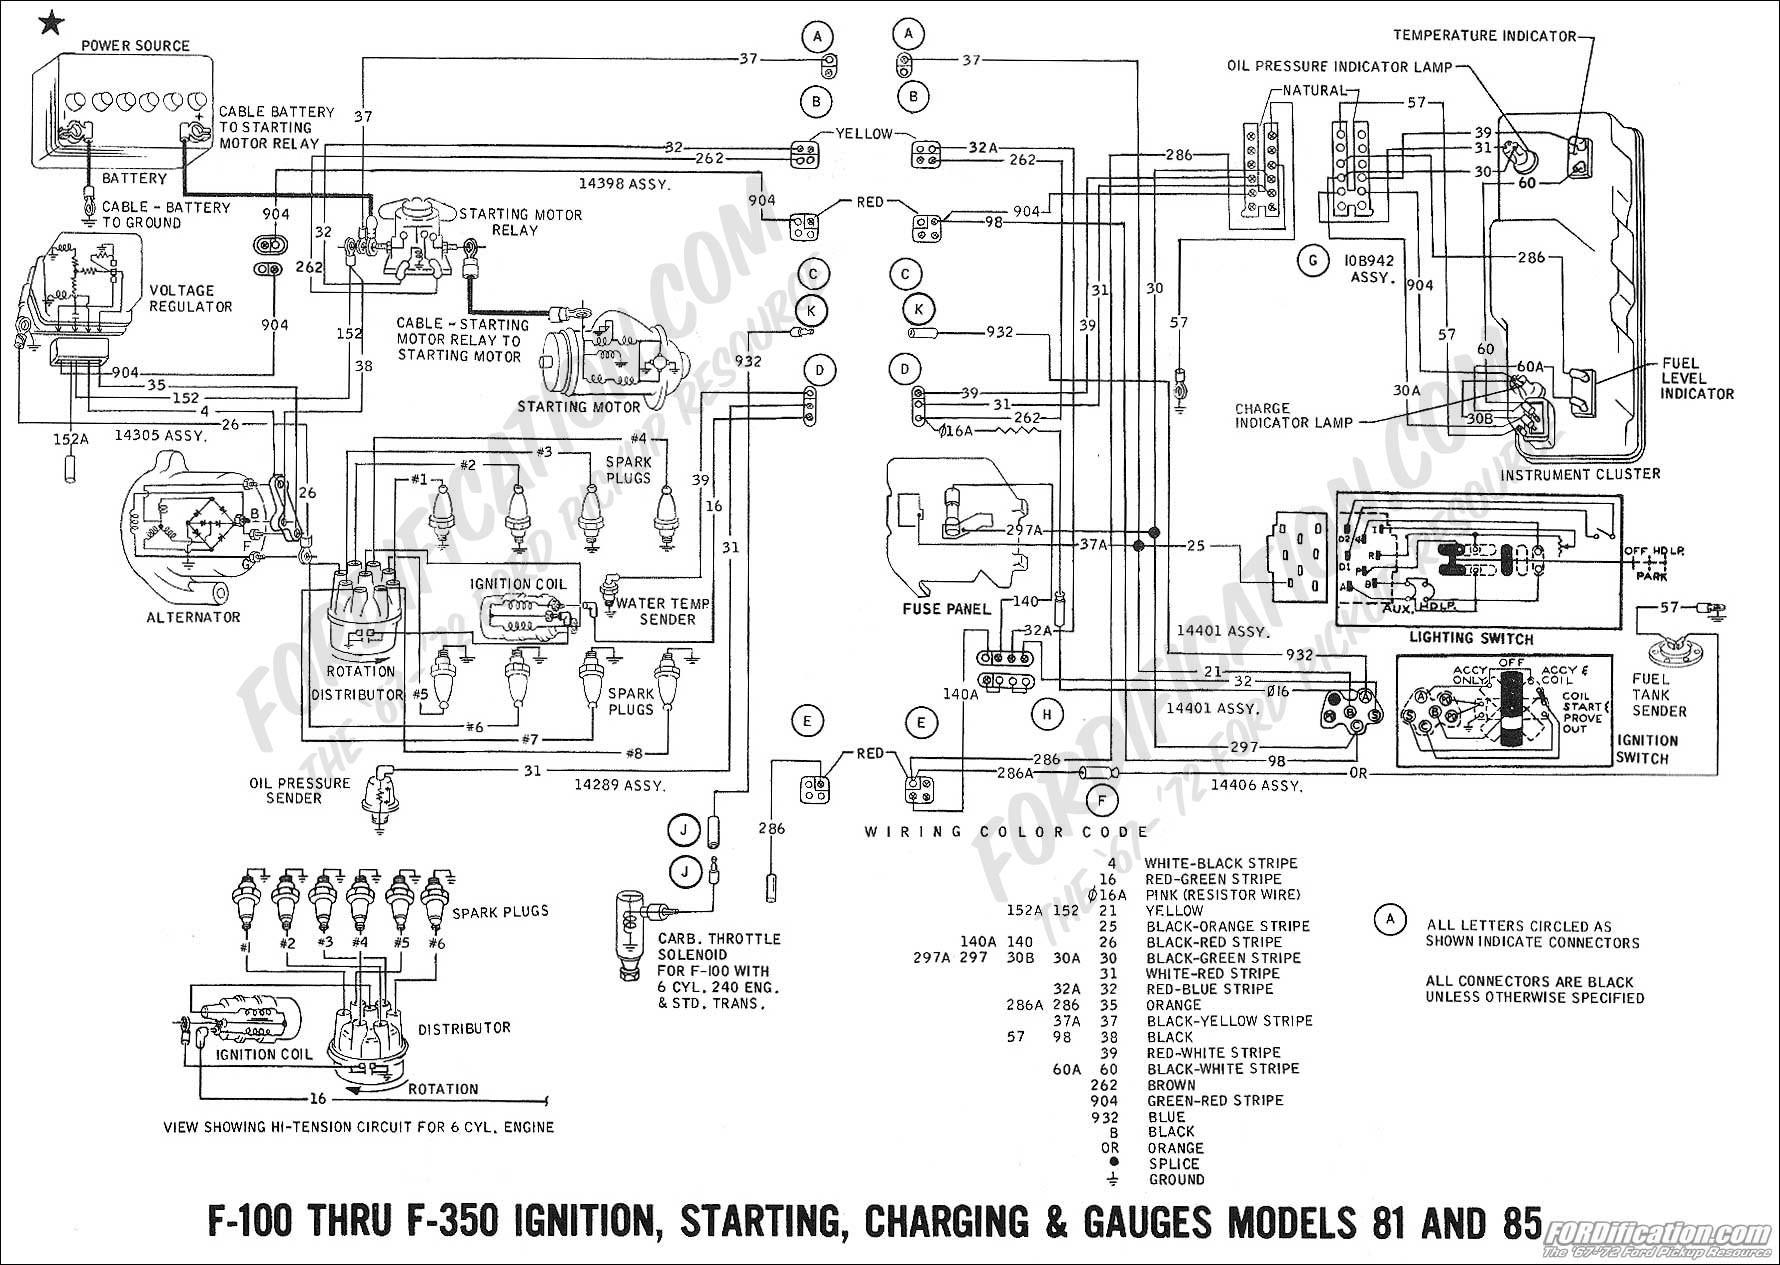 Xy 2514 1968 Mustang Turn Signal Wiring Diagram Schematic Schematic Wiring